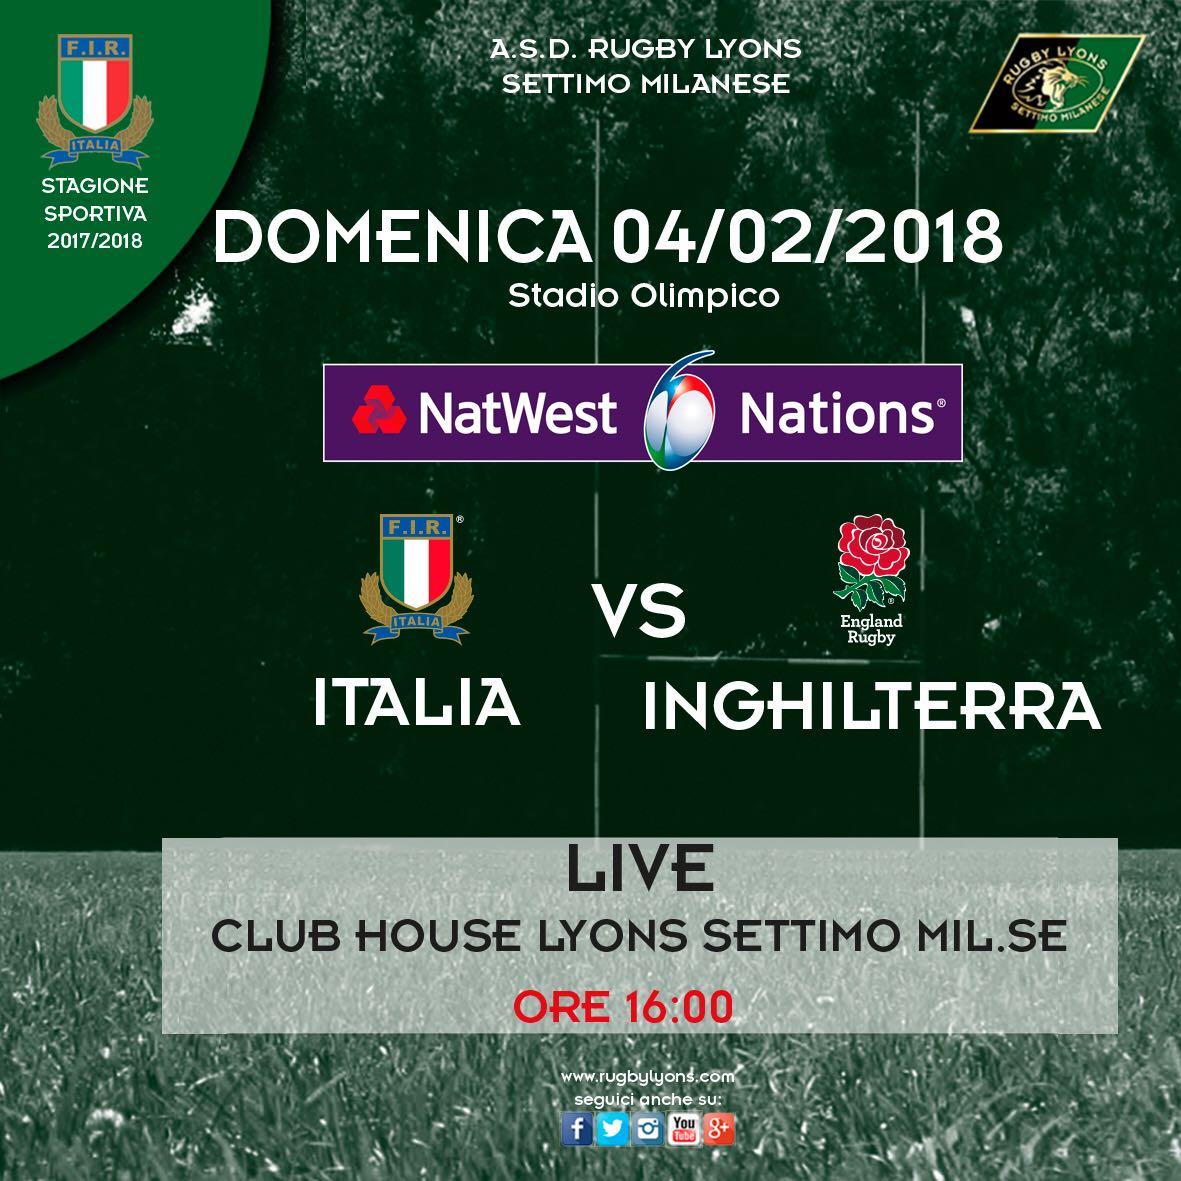 6 NAZIONI IN CLUB HOUSE – ITALIA vs INGHILTERRA